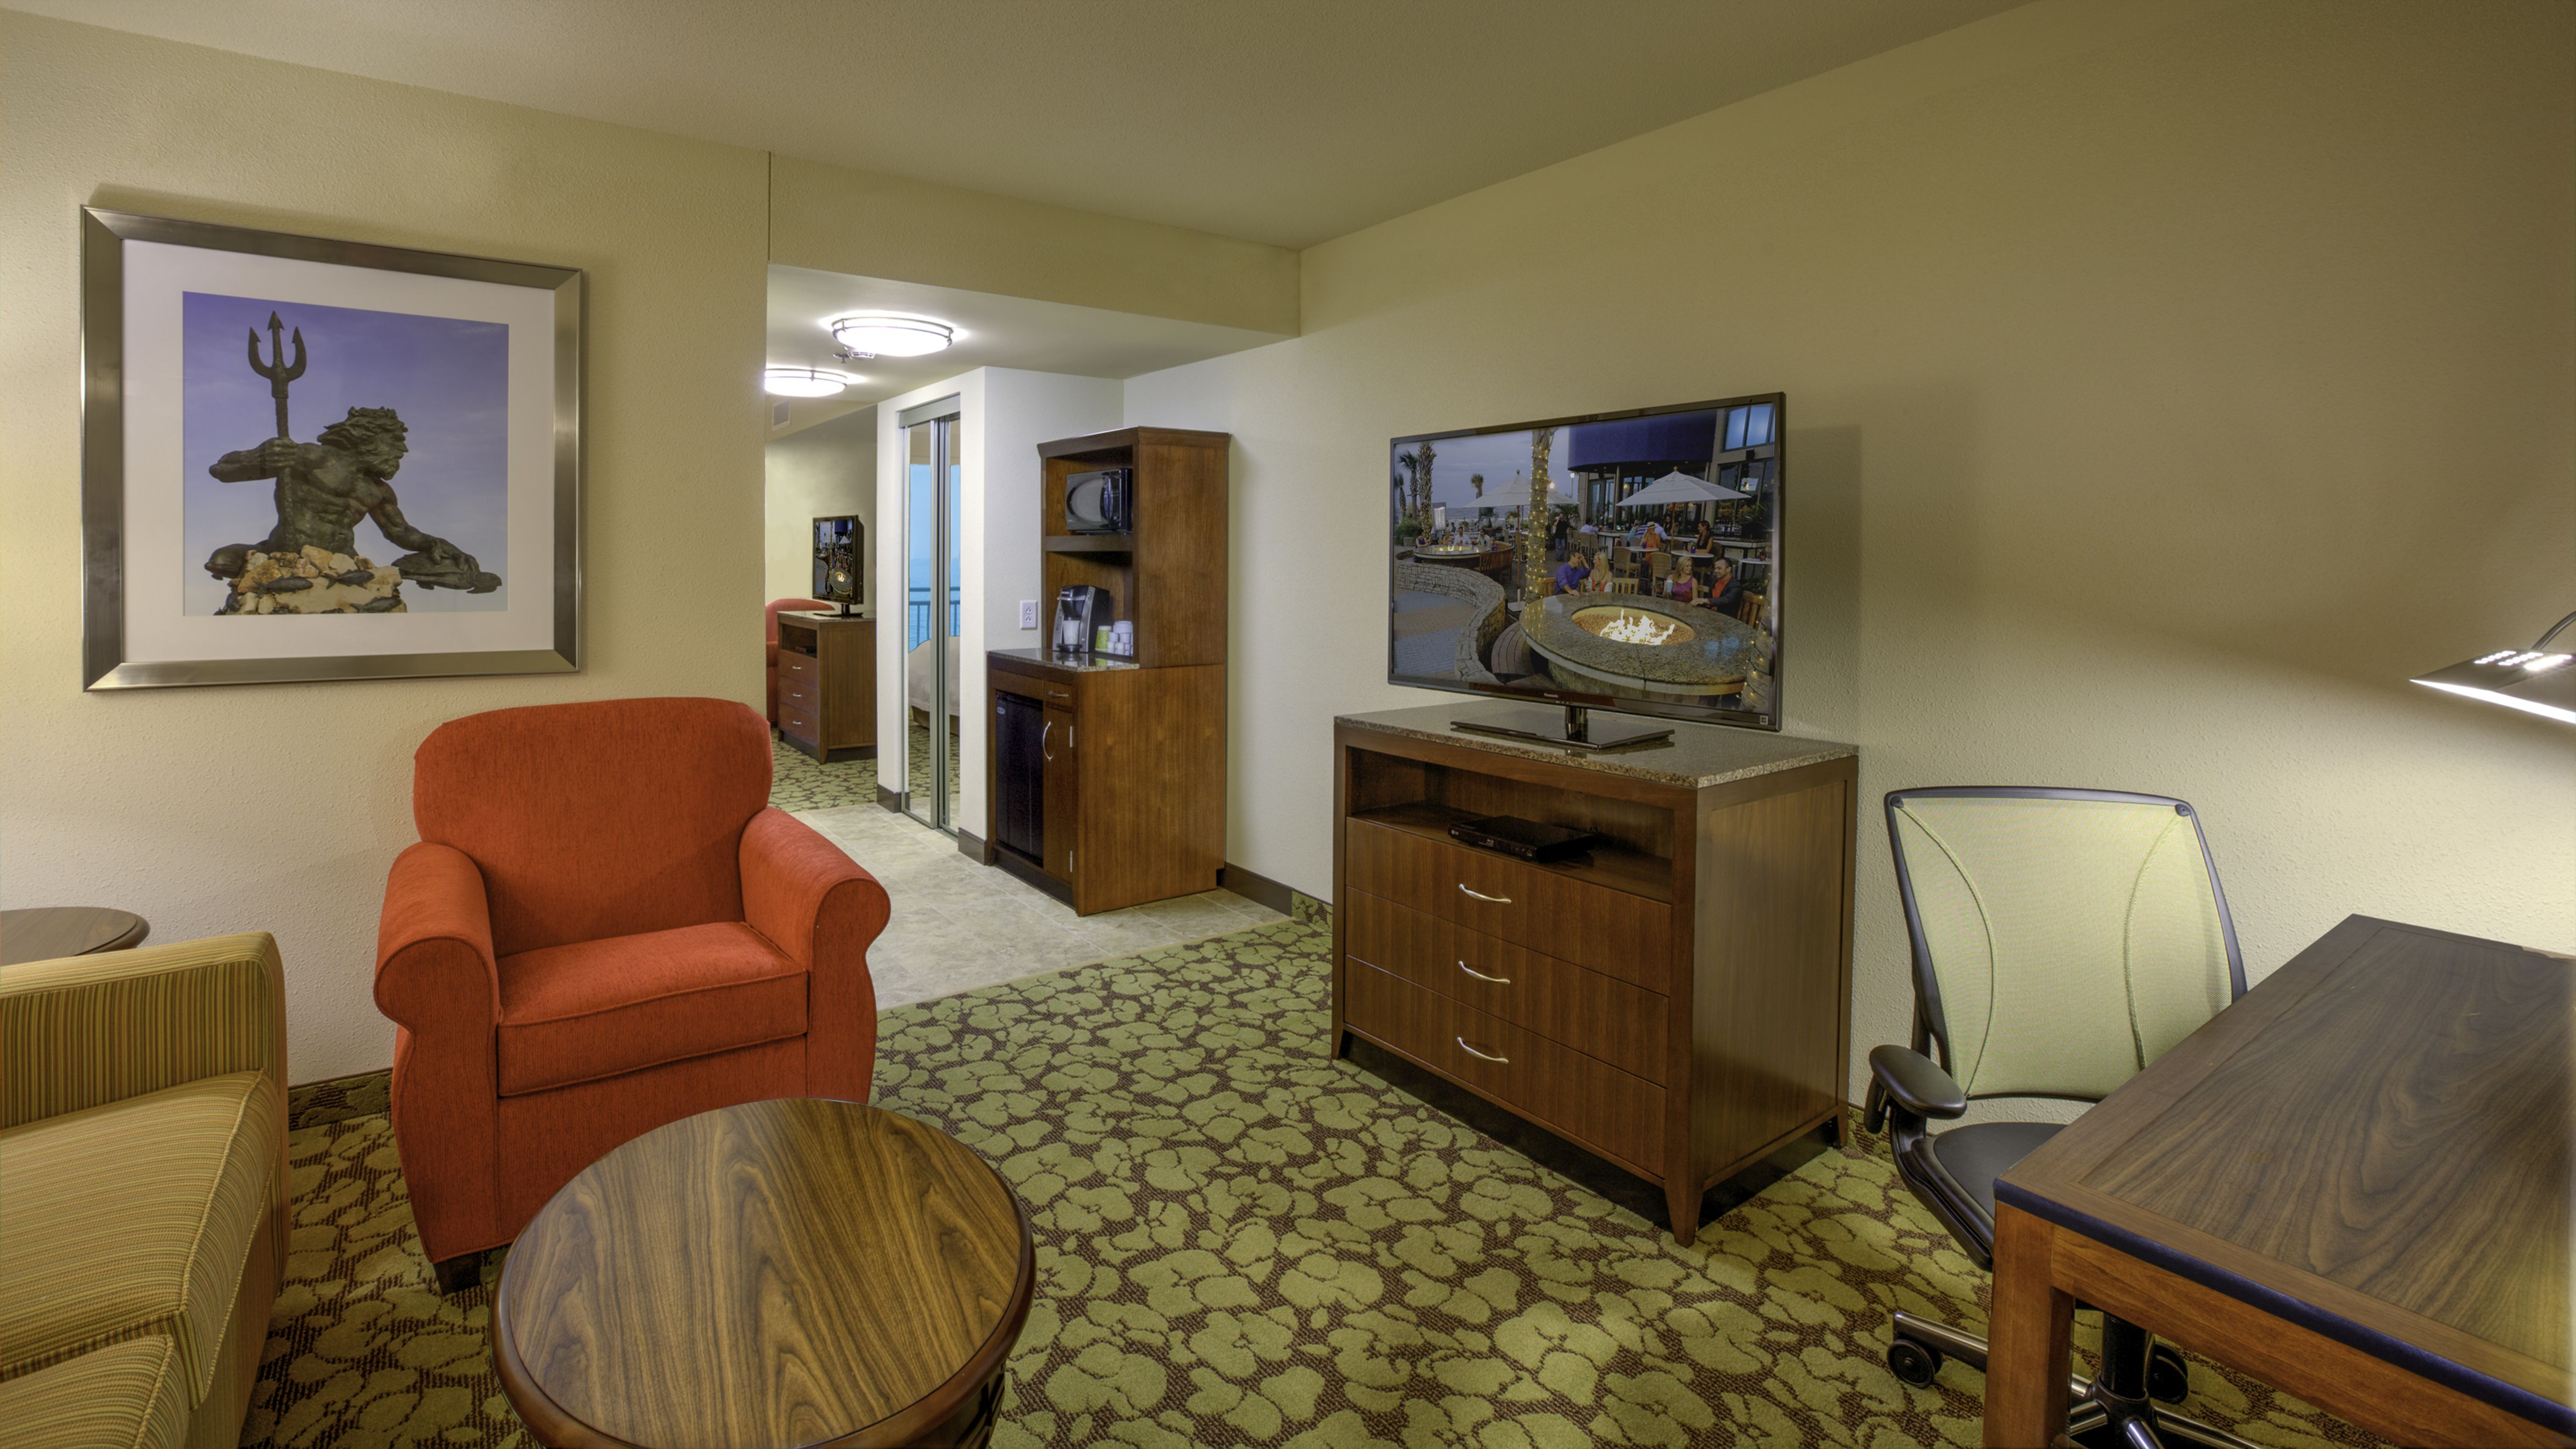 Exceptional Oceanfront Suite At The Hilton Garden Inn Virginia Beach Oceanfront. Amazing Ideas